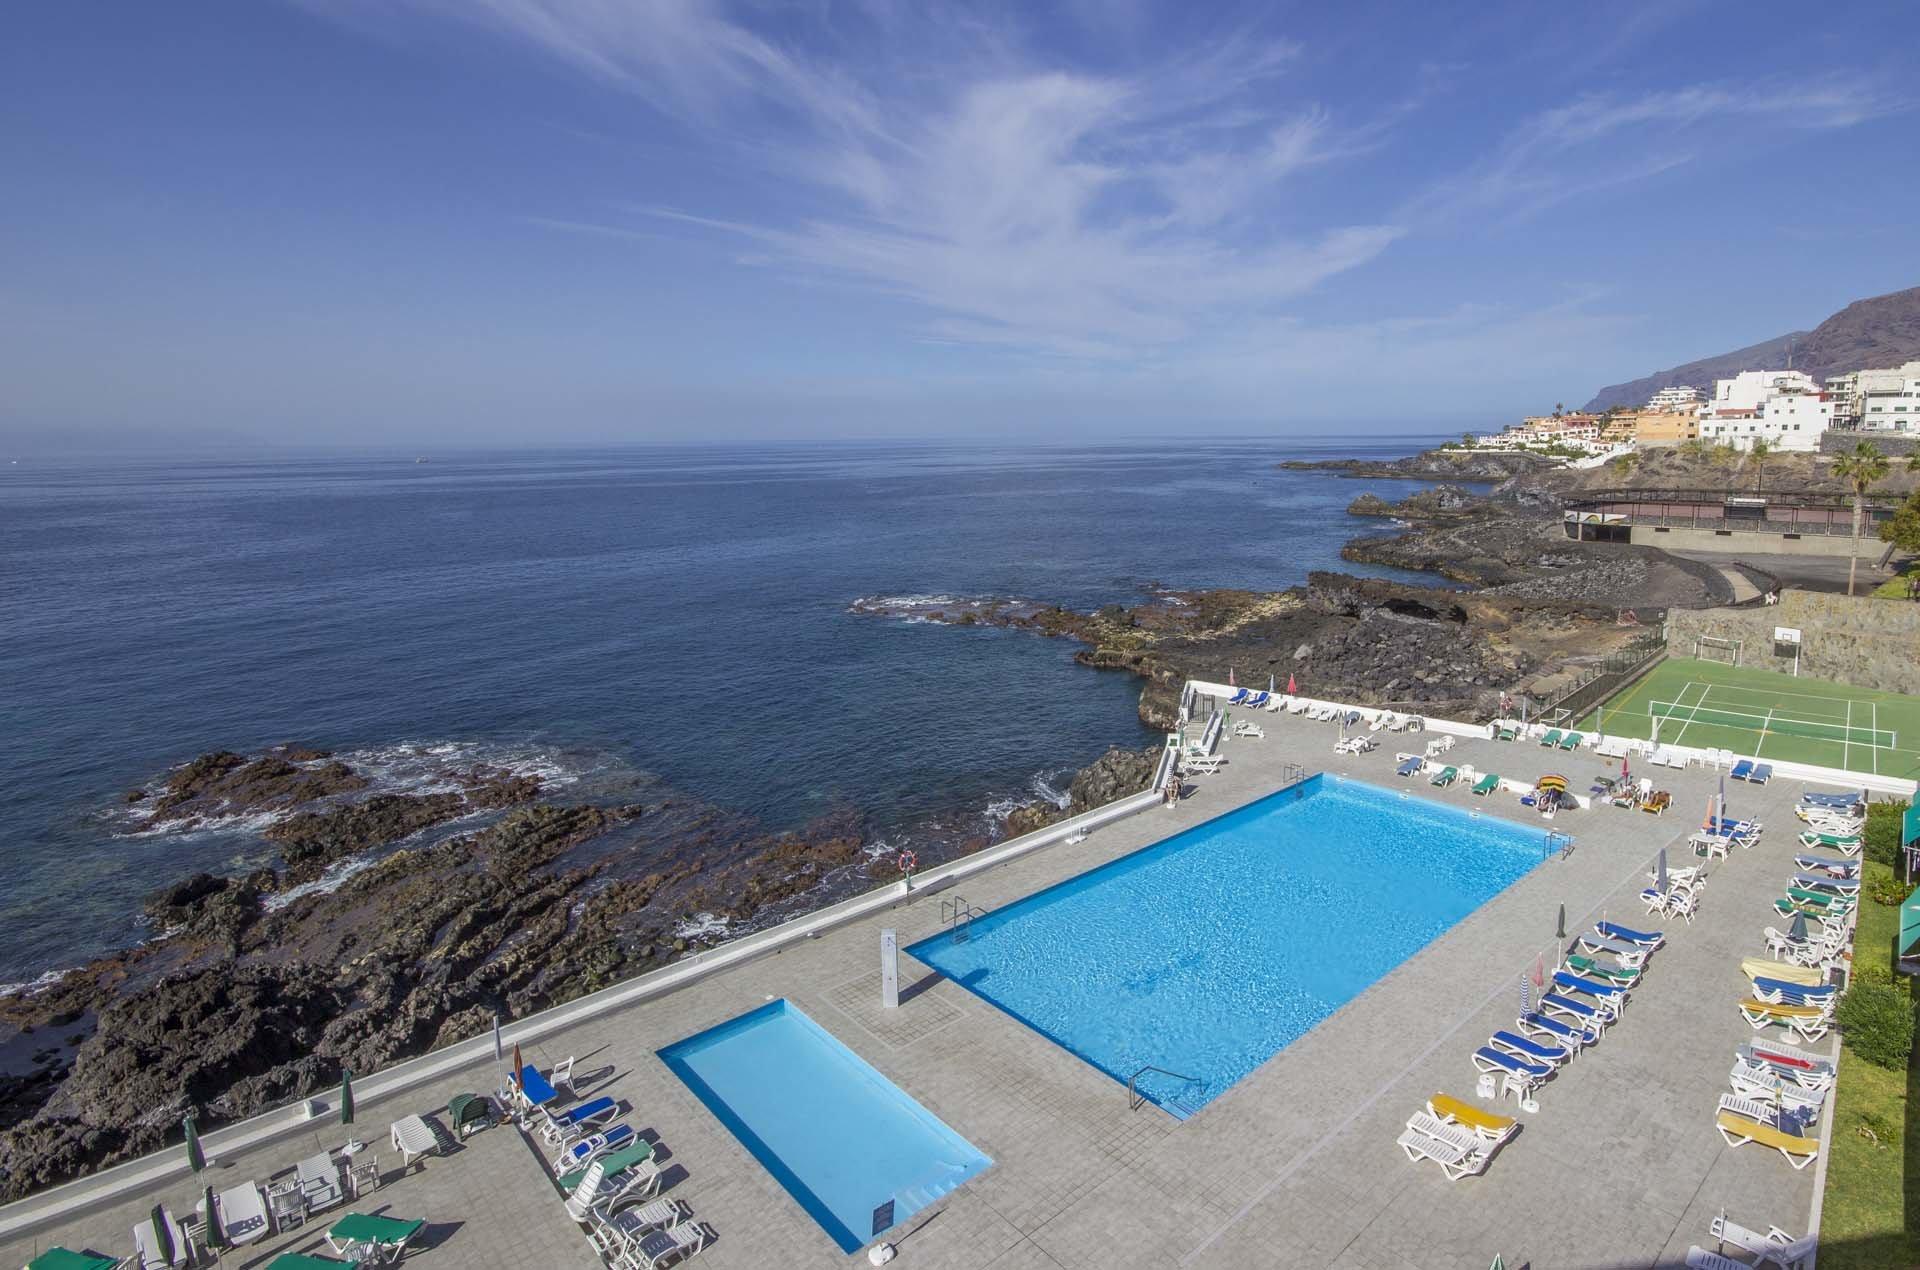 Playa San Juan Tenerife Property For Sale